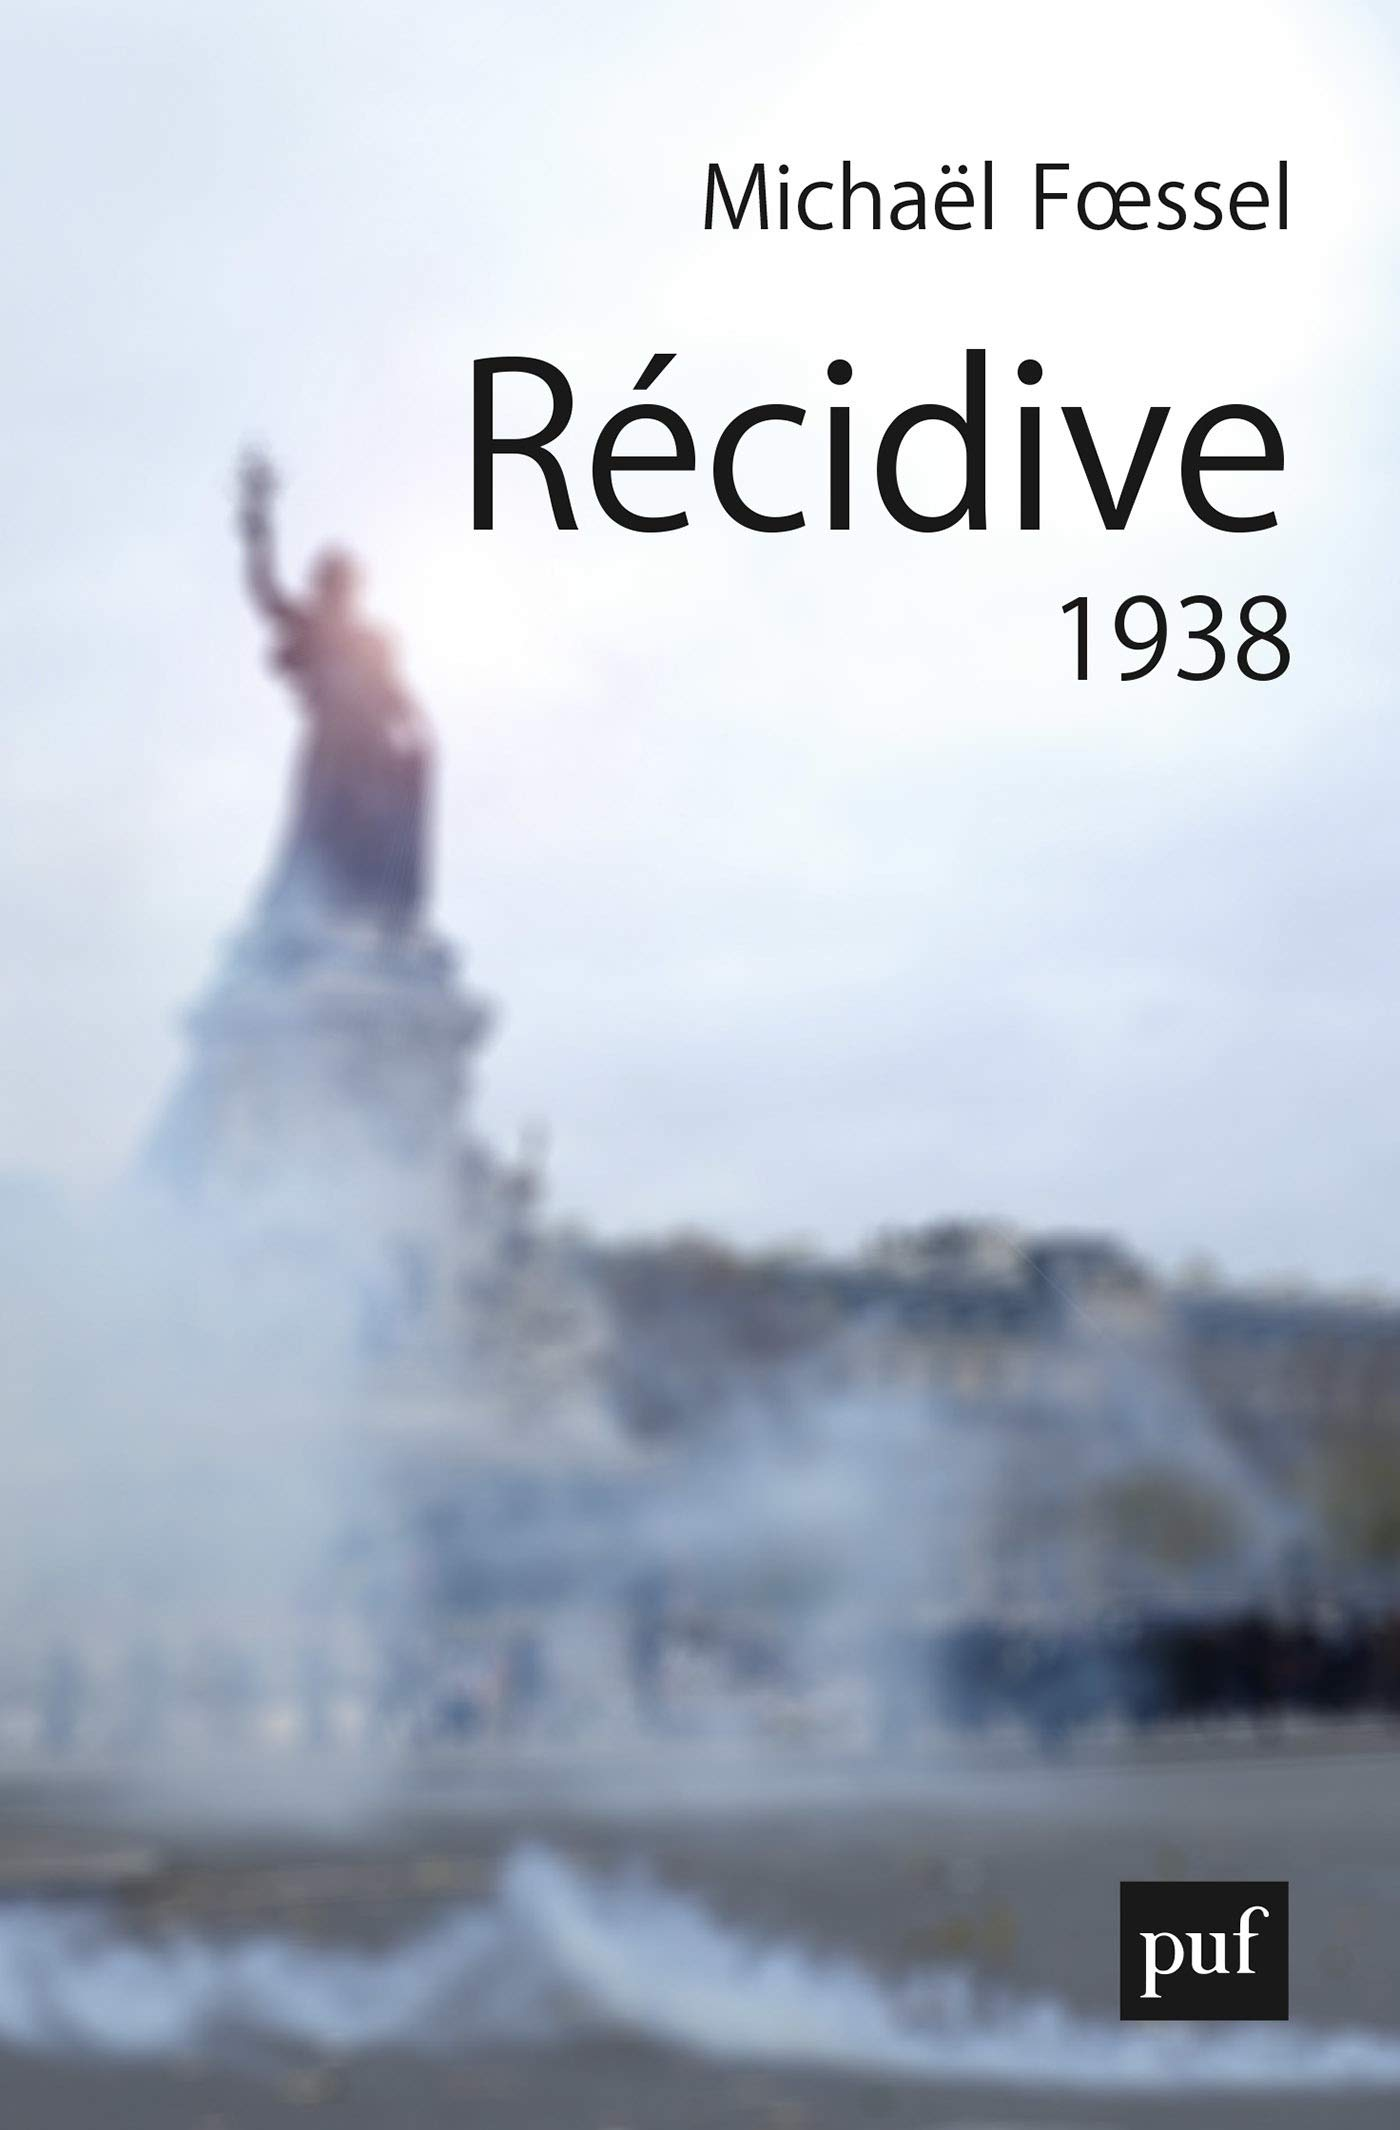 Récidive. 1938 (Hors collection) por Michaël Foessel